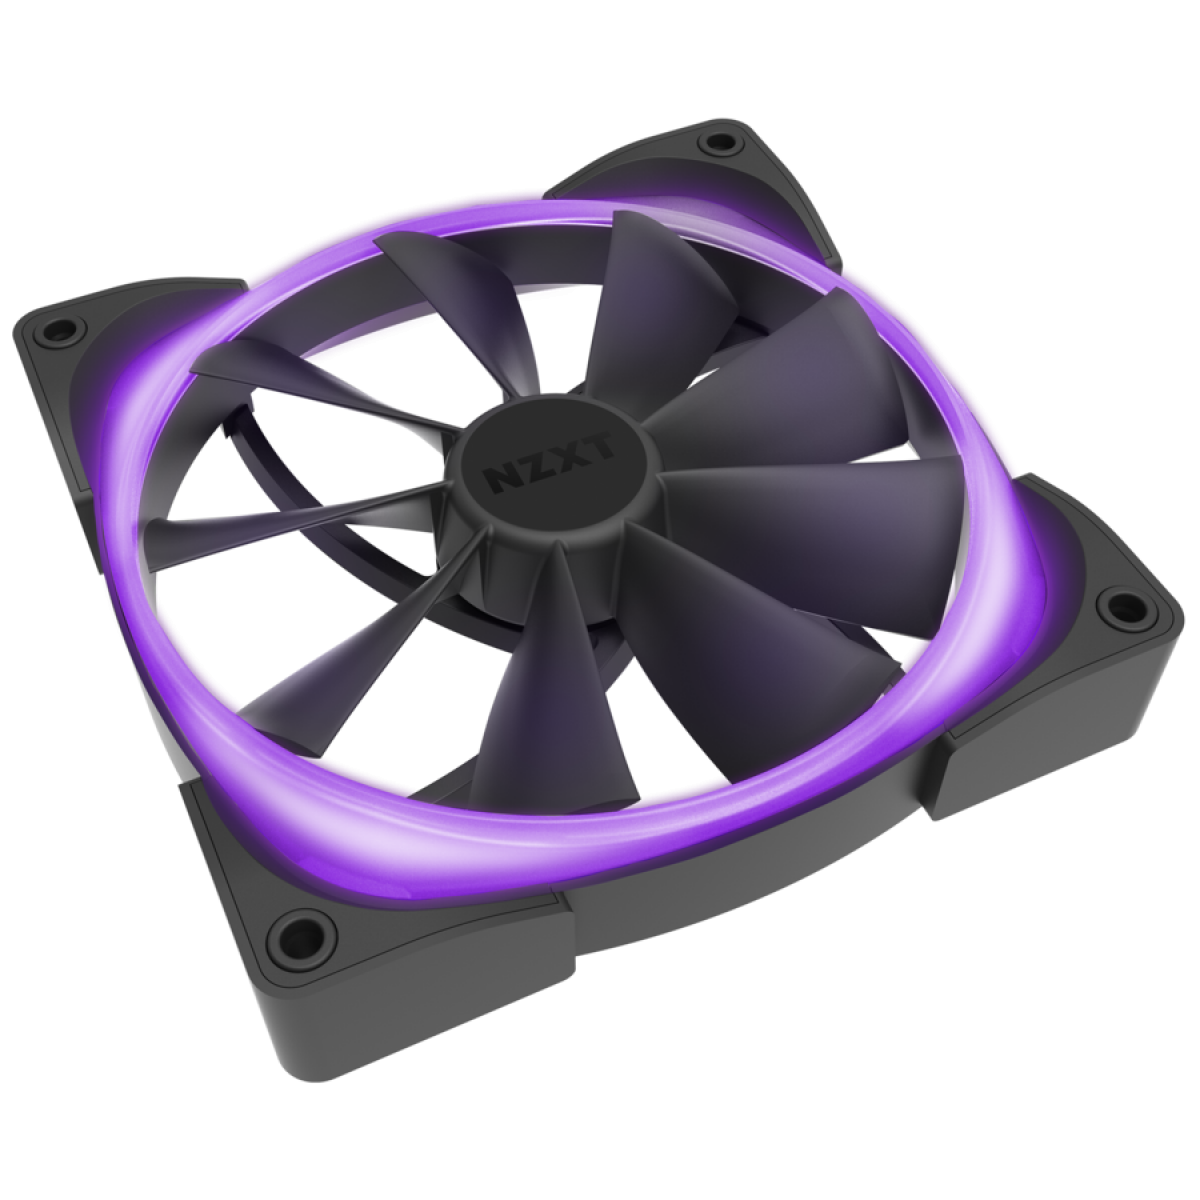 Kit Controlador de Iluminação Led  HUE2 + 2 Fan 120mm Led RGB NZXT, HF-2812C-D1